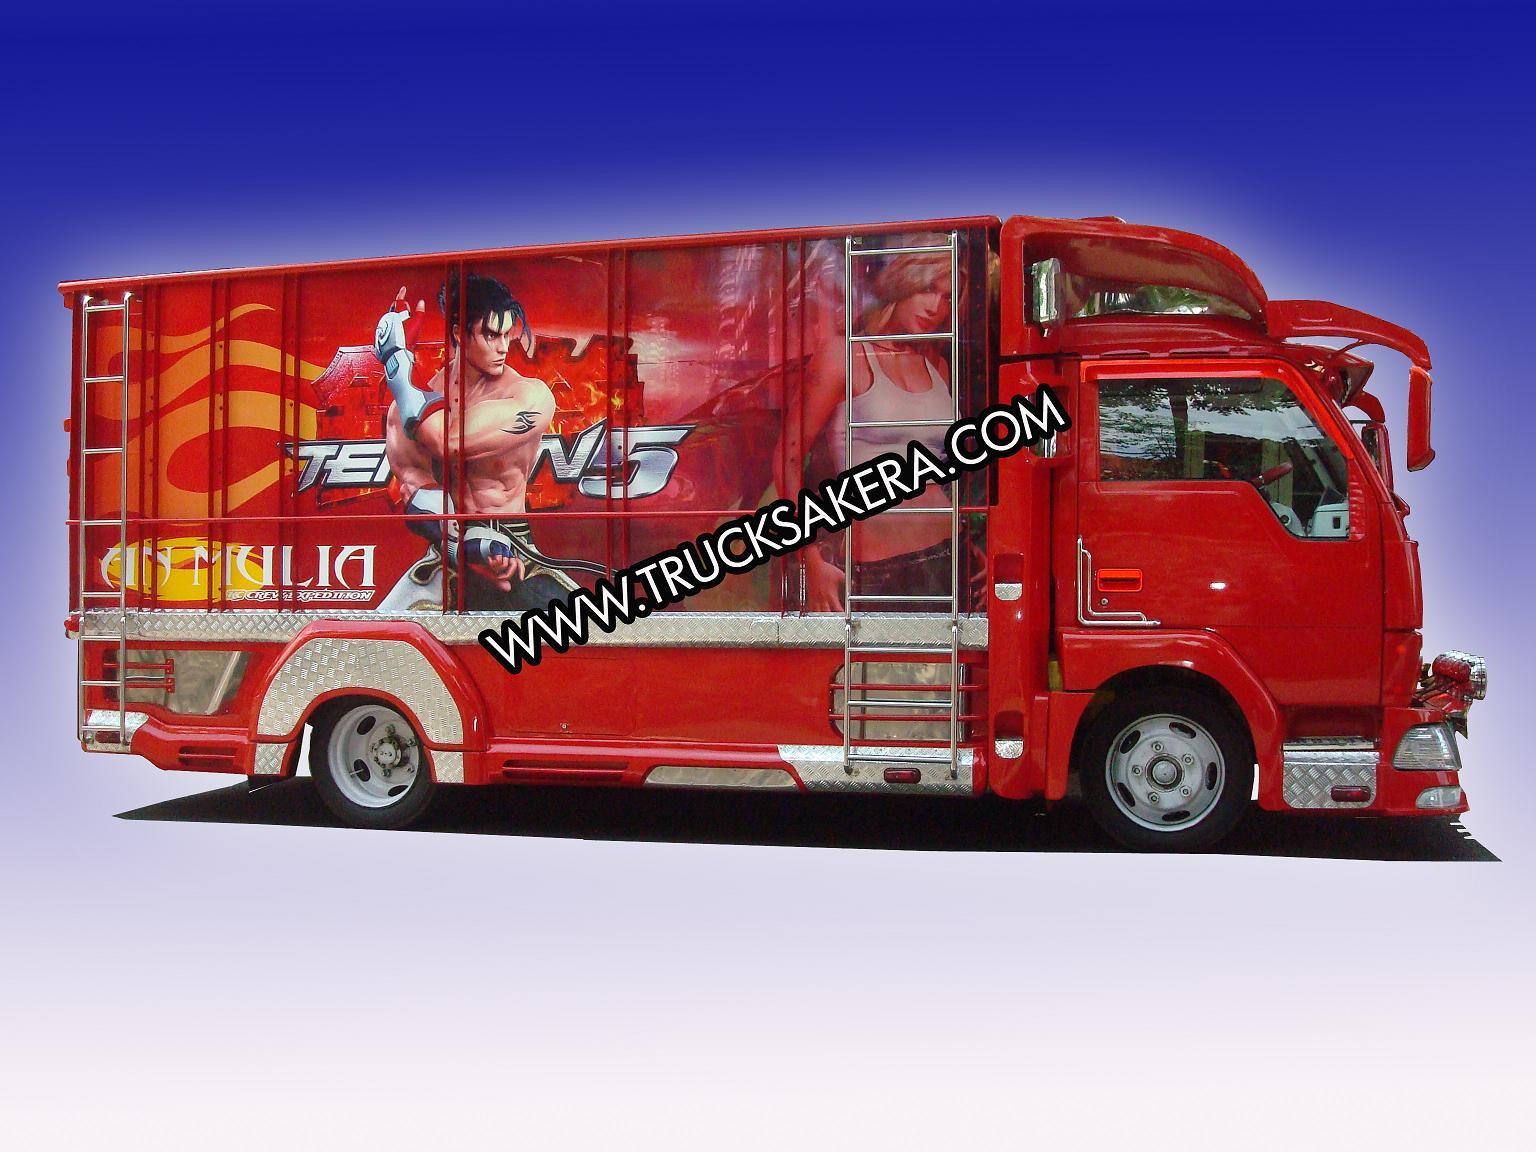 I LOVE OTOMOTIF Beatiful Truck From Banjarnegara Indonesia Part 1